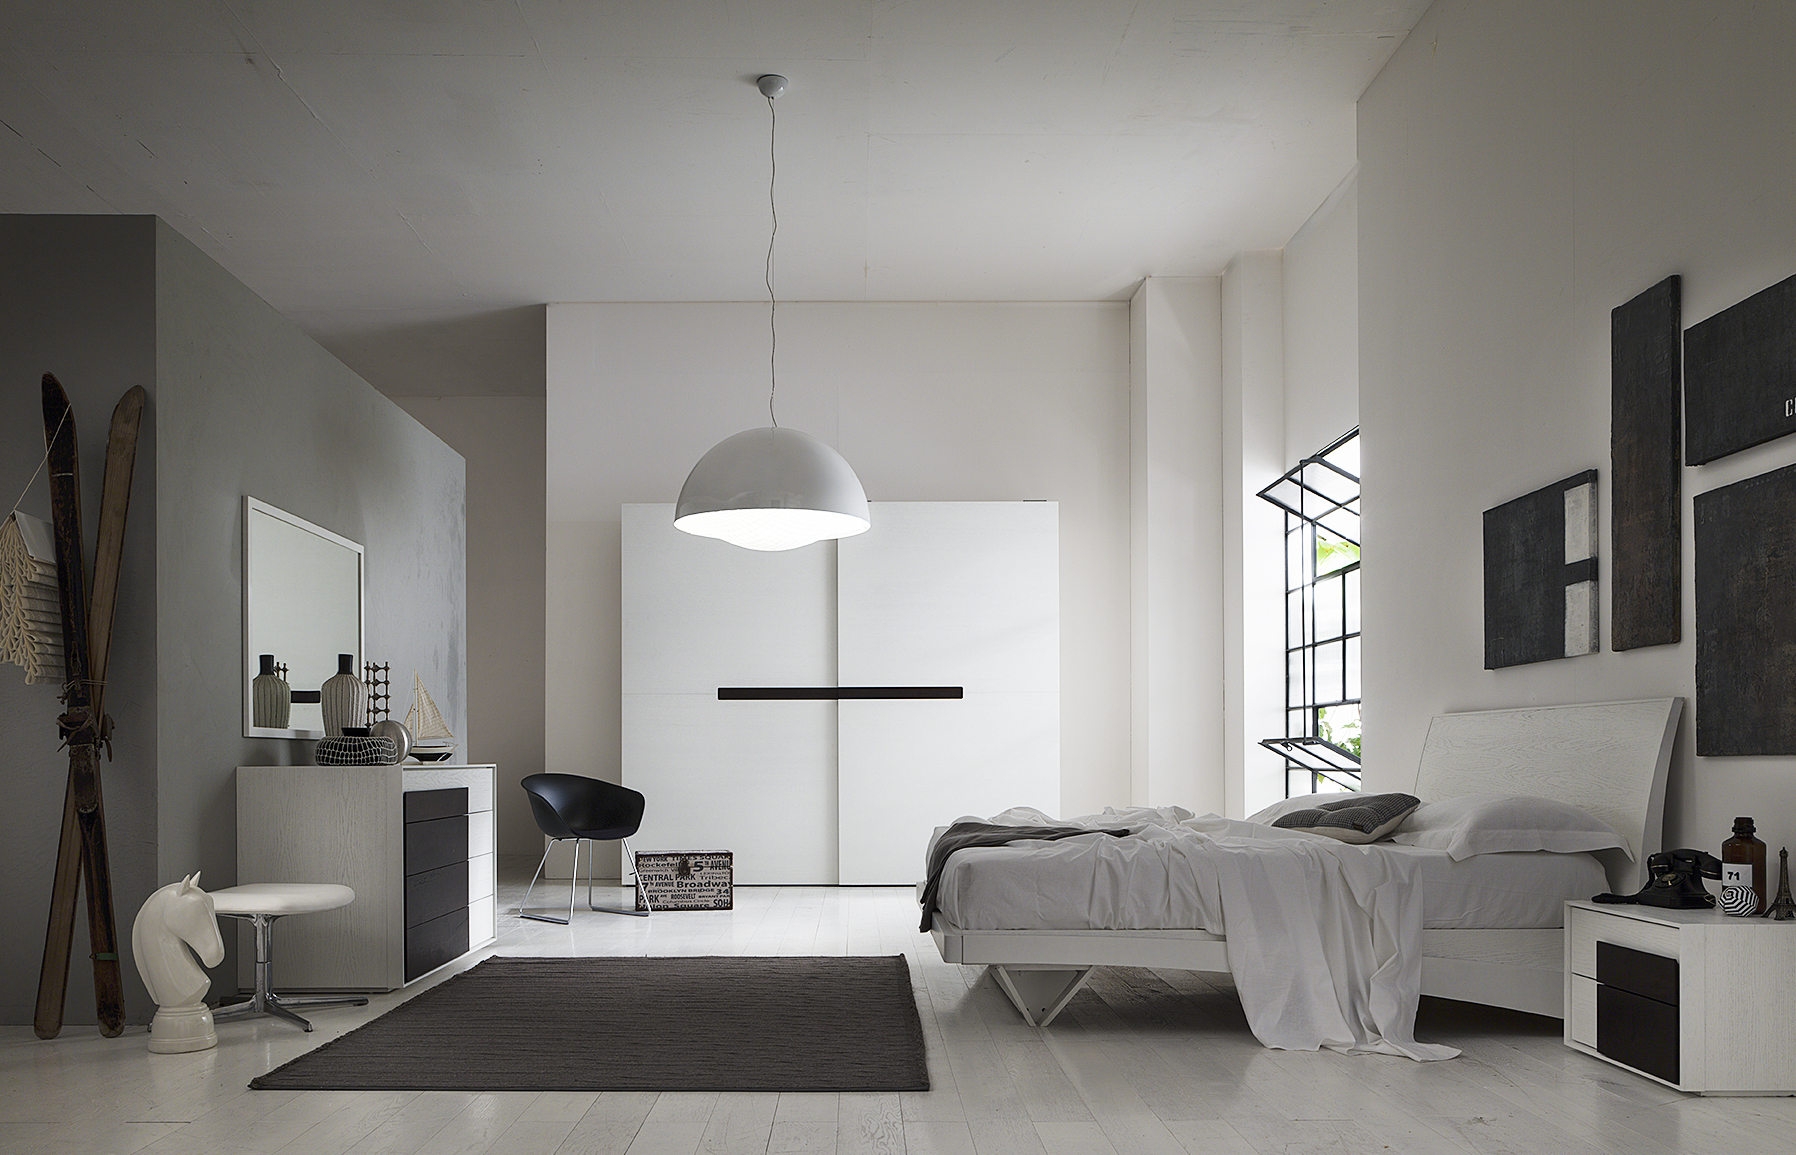 Camera moderna bianca good colori pareti camera da letto il bianco with camera moderna bianca - Camera da letto moderna bianca laccata ...